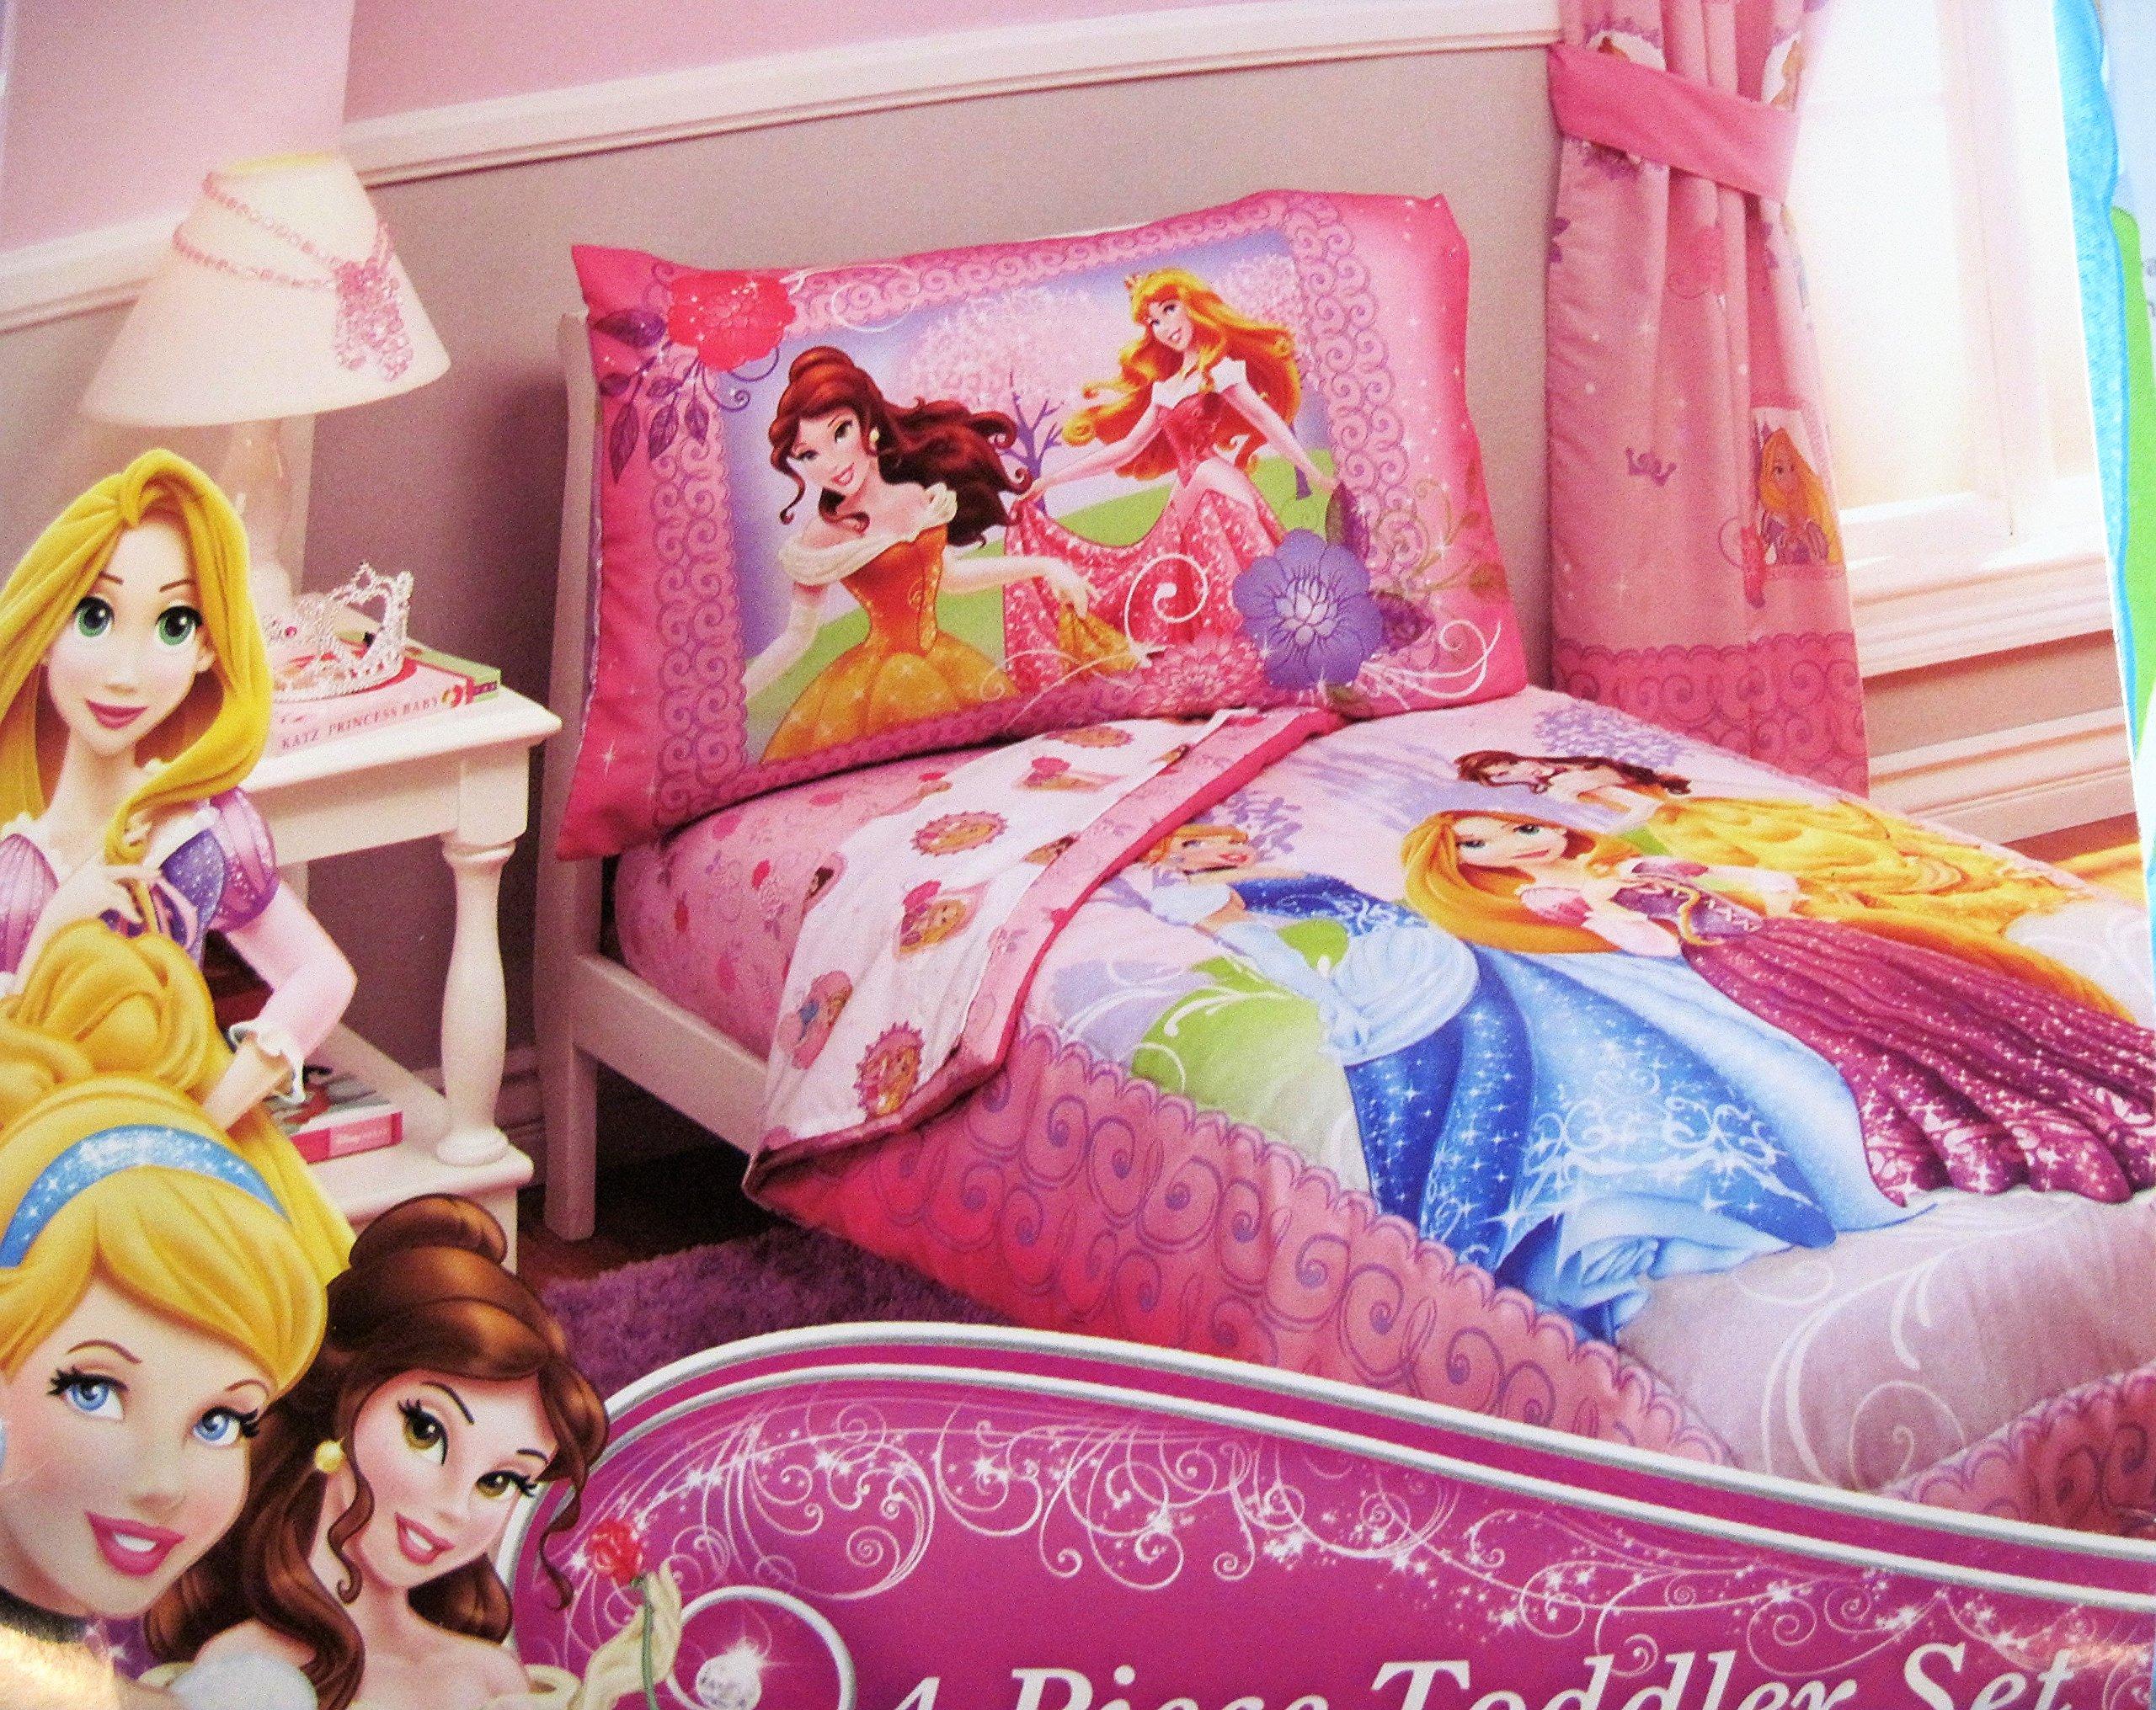 Disney Princess Girls Timeless Elegance 4 Piece Toddler Bedding Set 85214091877